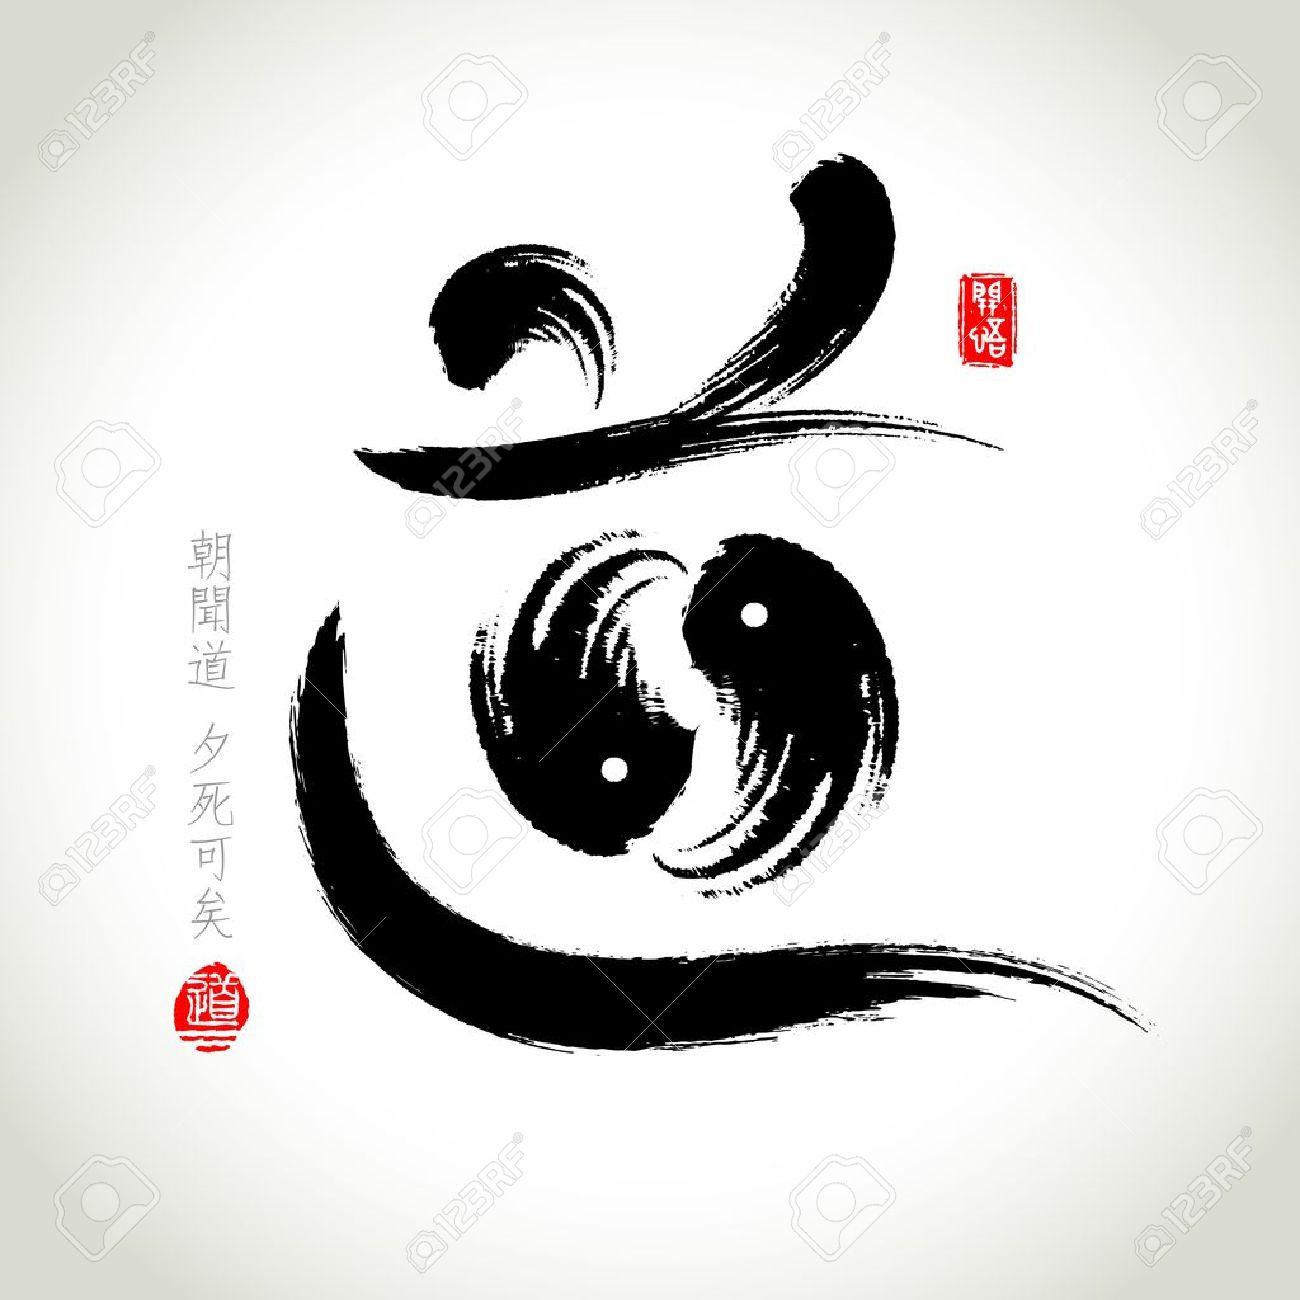 Chinese hanzi penmanship calligraphy principium as confucius chinese hanzi penmanship calligraphy principium as confucius said he who learns the truth in buycottarizona Choice Image